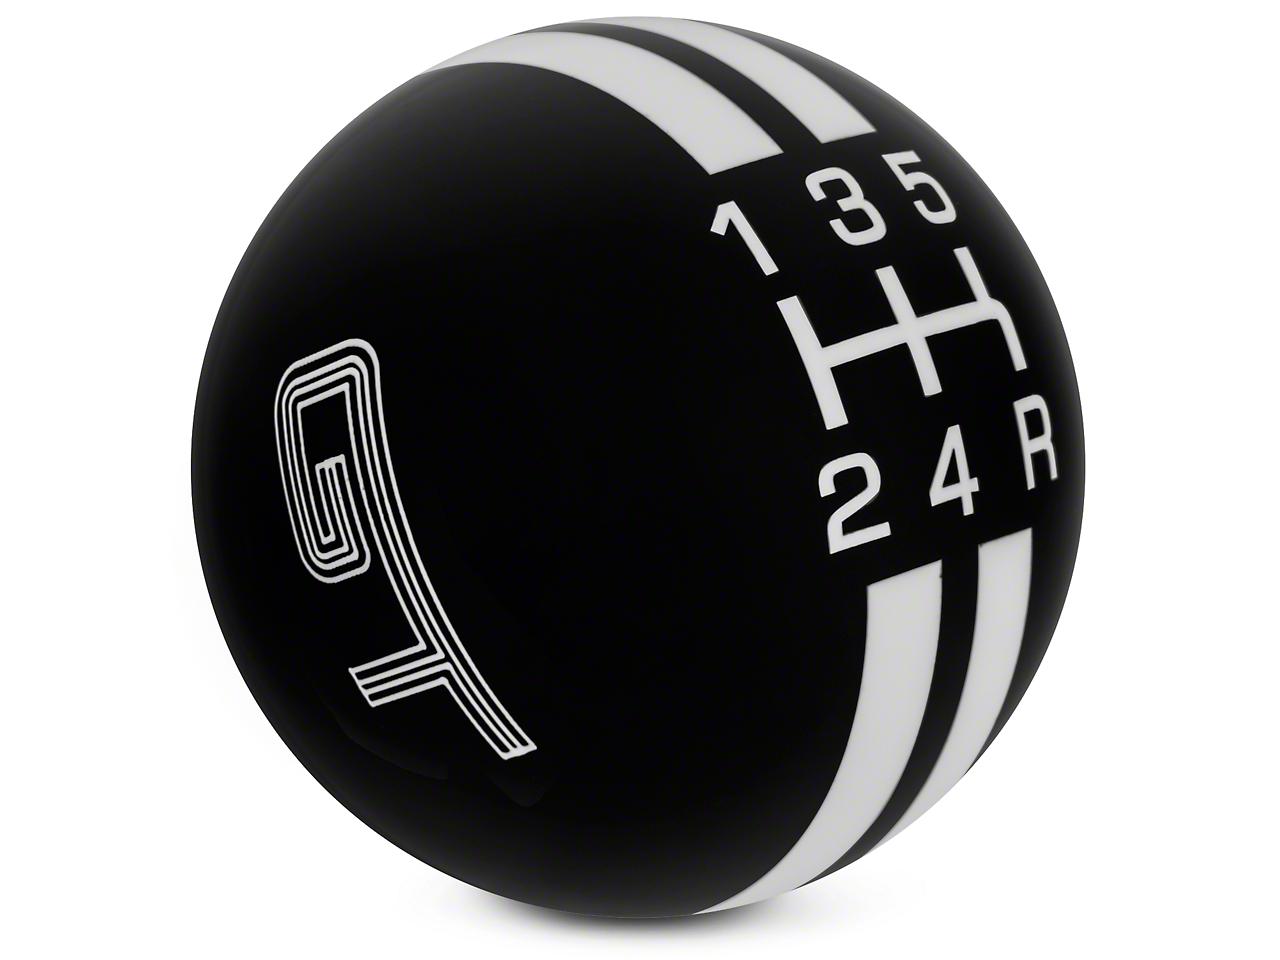 Rally Stripe 5-Speed Shift Knob w/ GT Logo - Black/White (05-10 GT, V6)